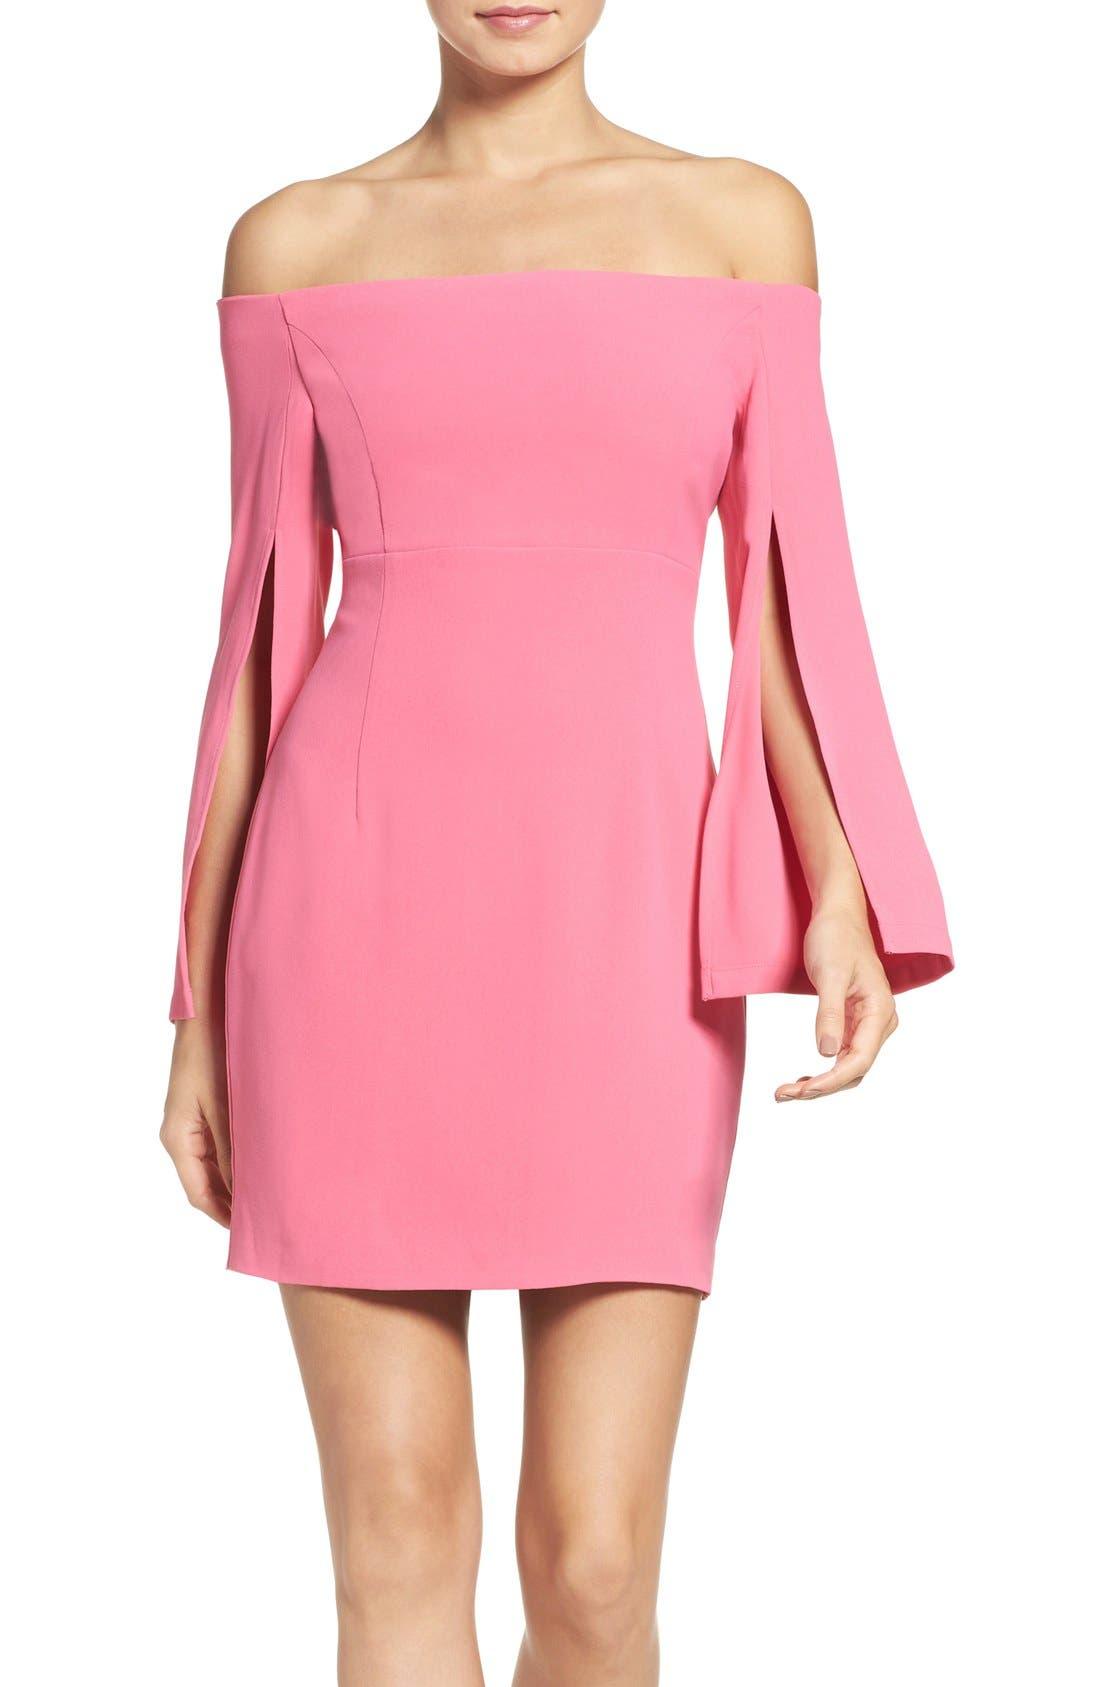 Ava Off the Shoulder Dress,                         Main,                         color, 668